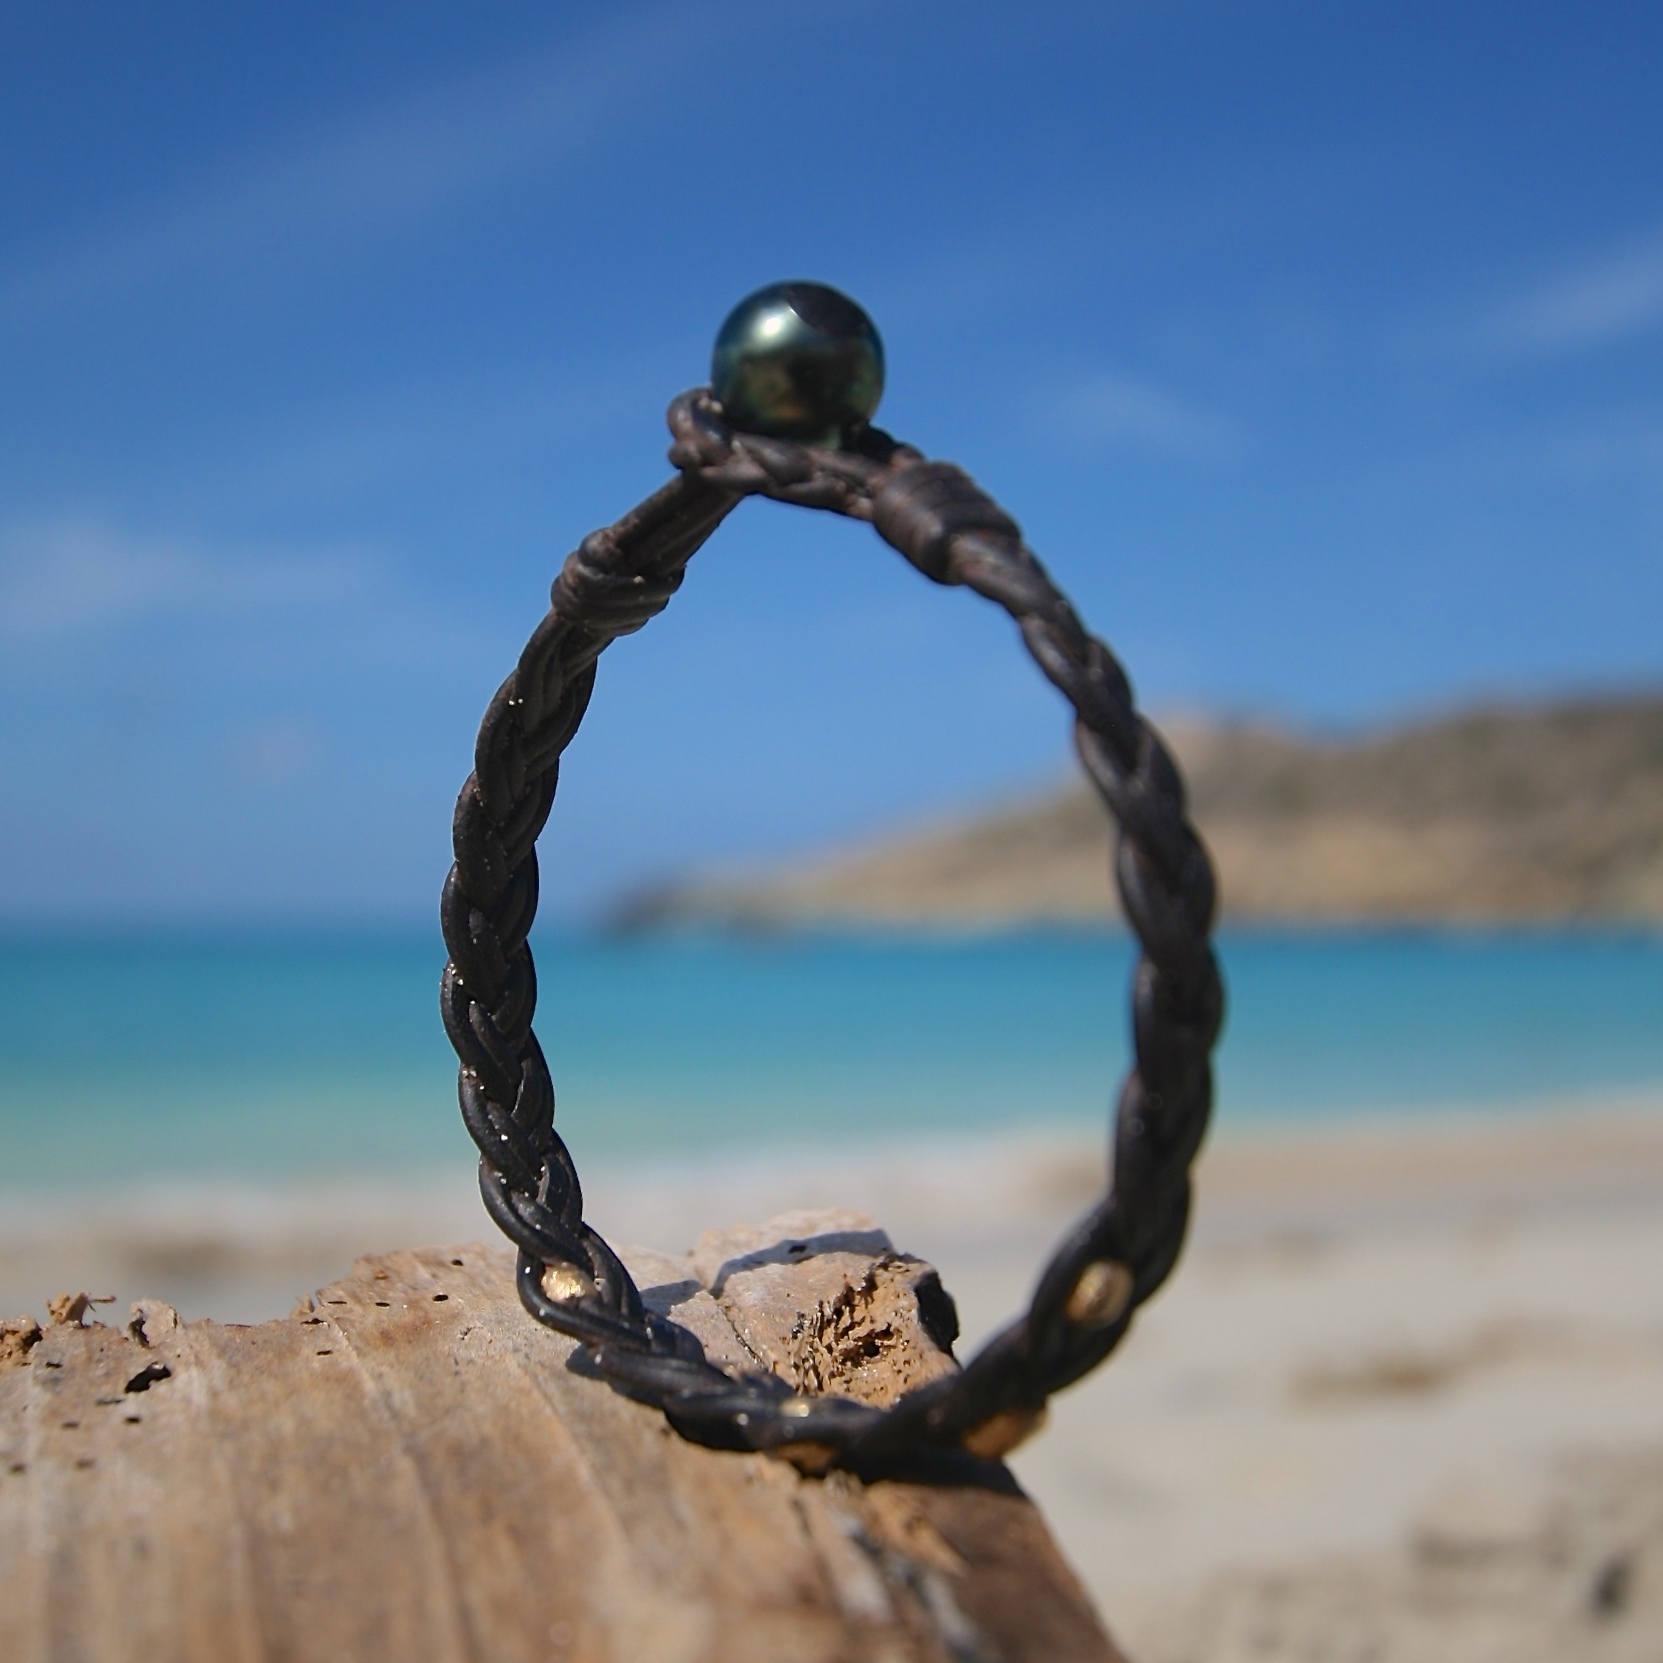 bracelet for men leather St Barths jewelry